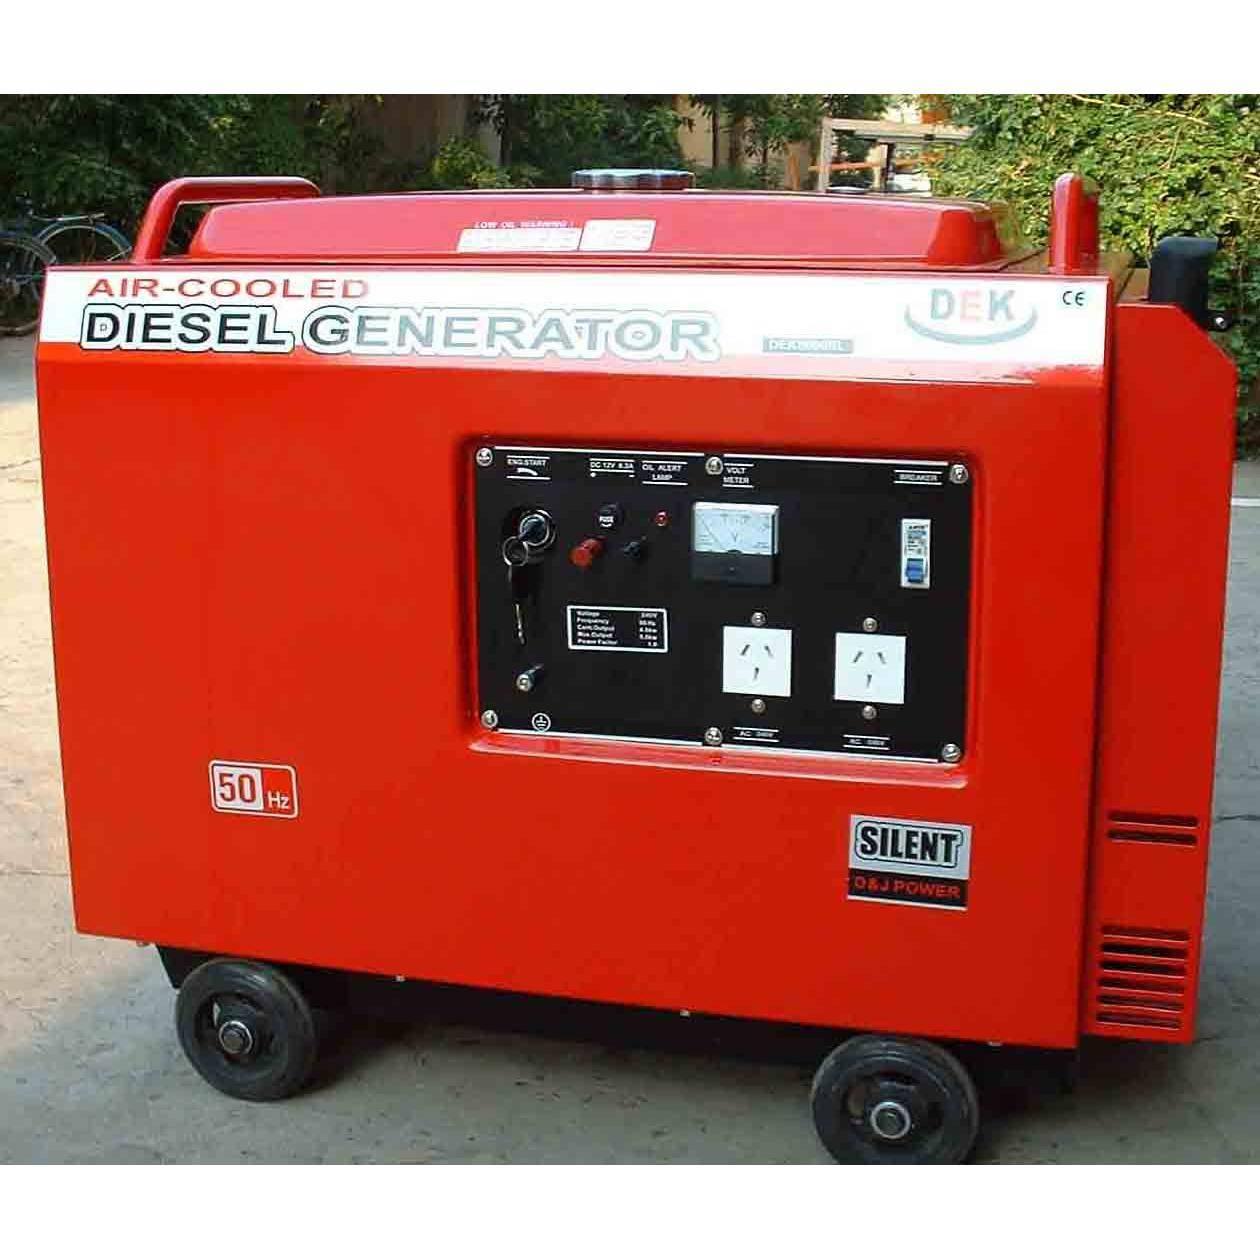 engine, pump, generator set